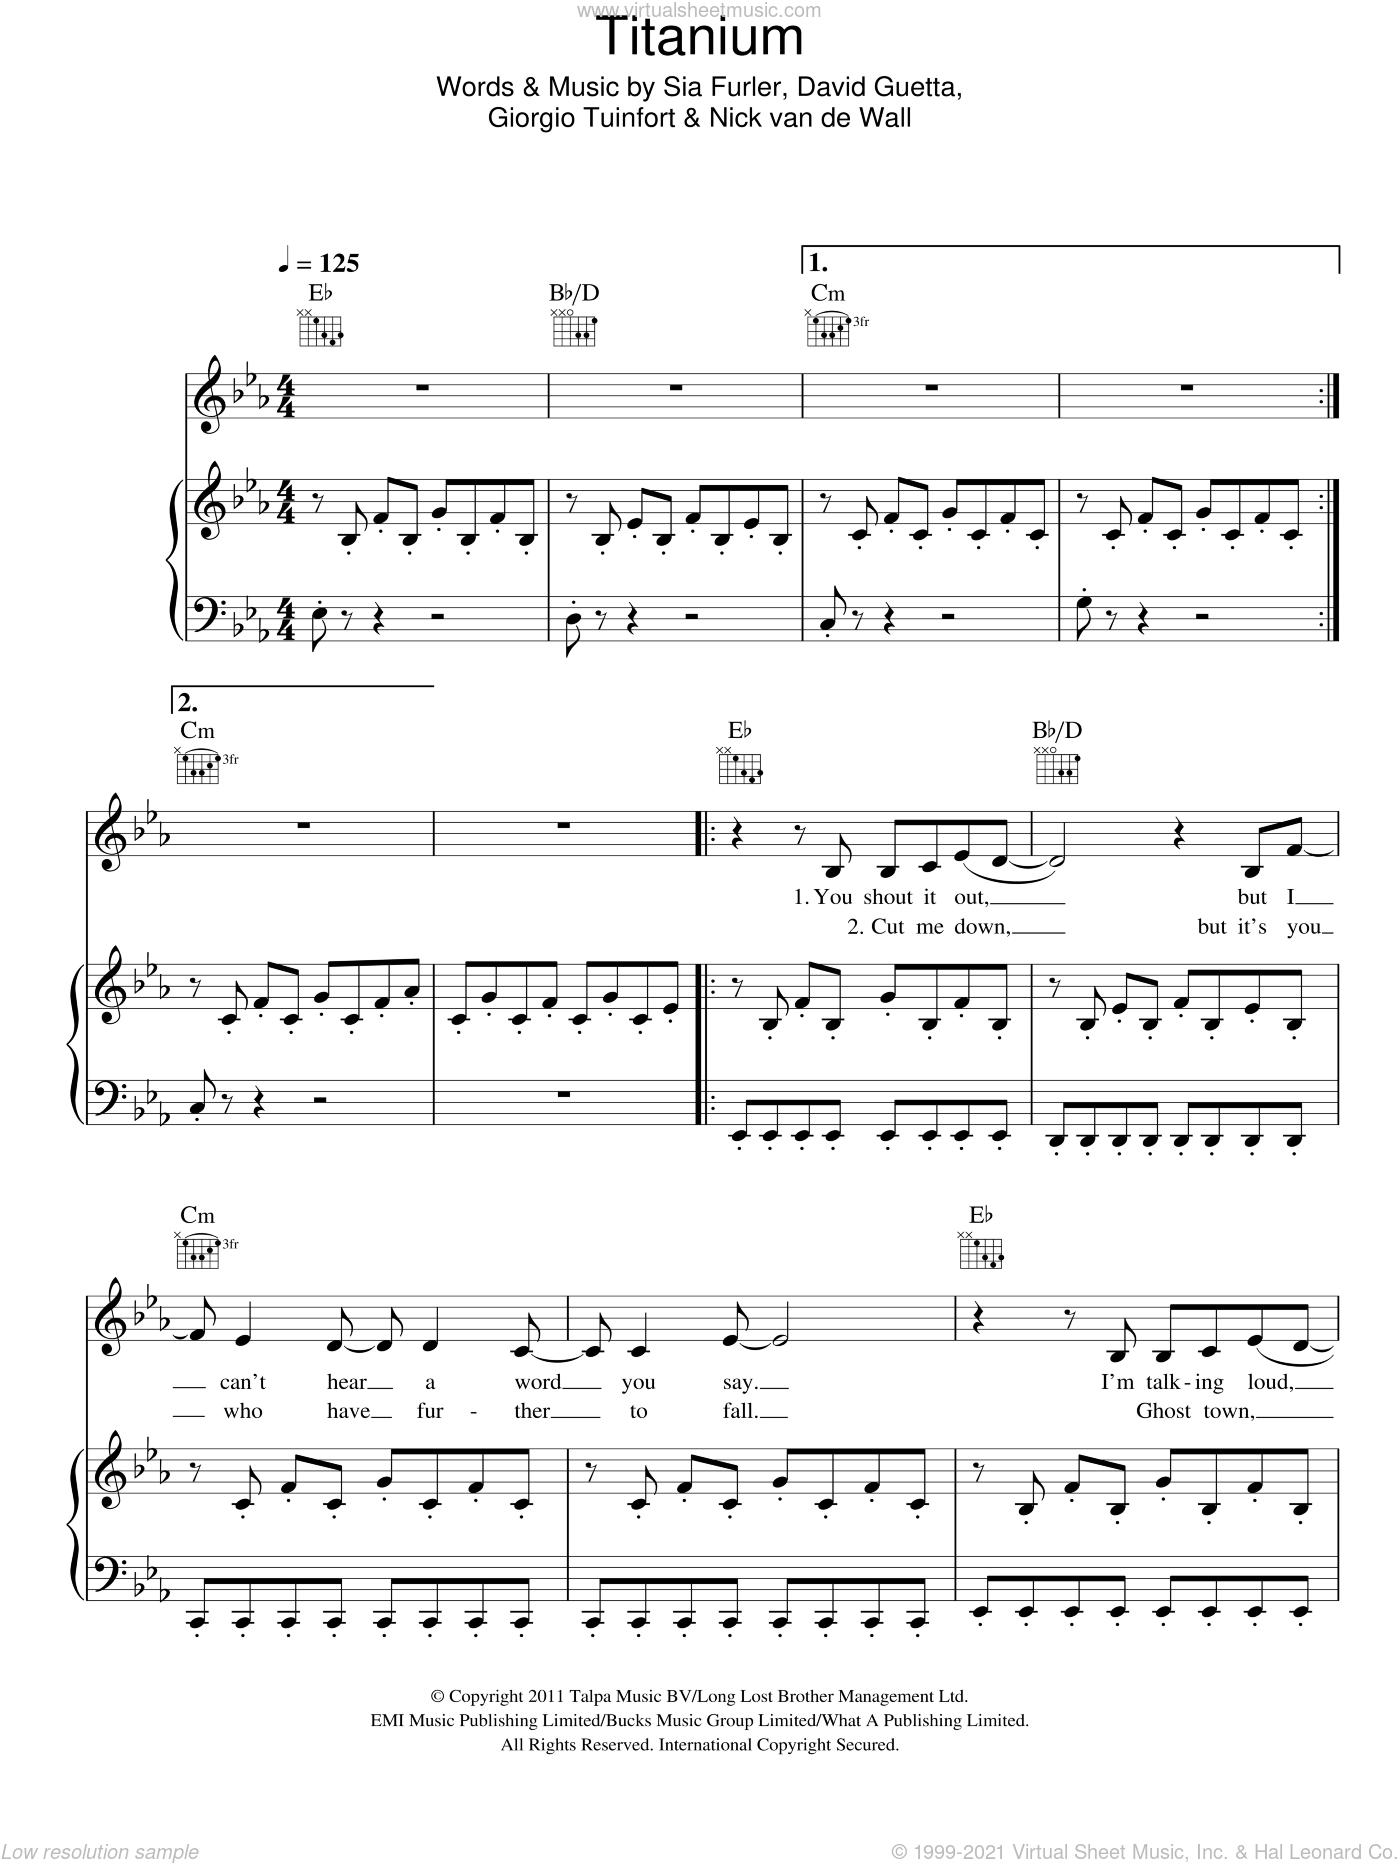 Titanium sheet music for voice, piano or guitar by David Guetta featuring Sia, David Guetta, Giorgio Tuinfort, Nick van de Wall and Sia Furler, intermediate skill level